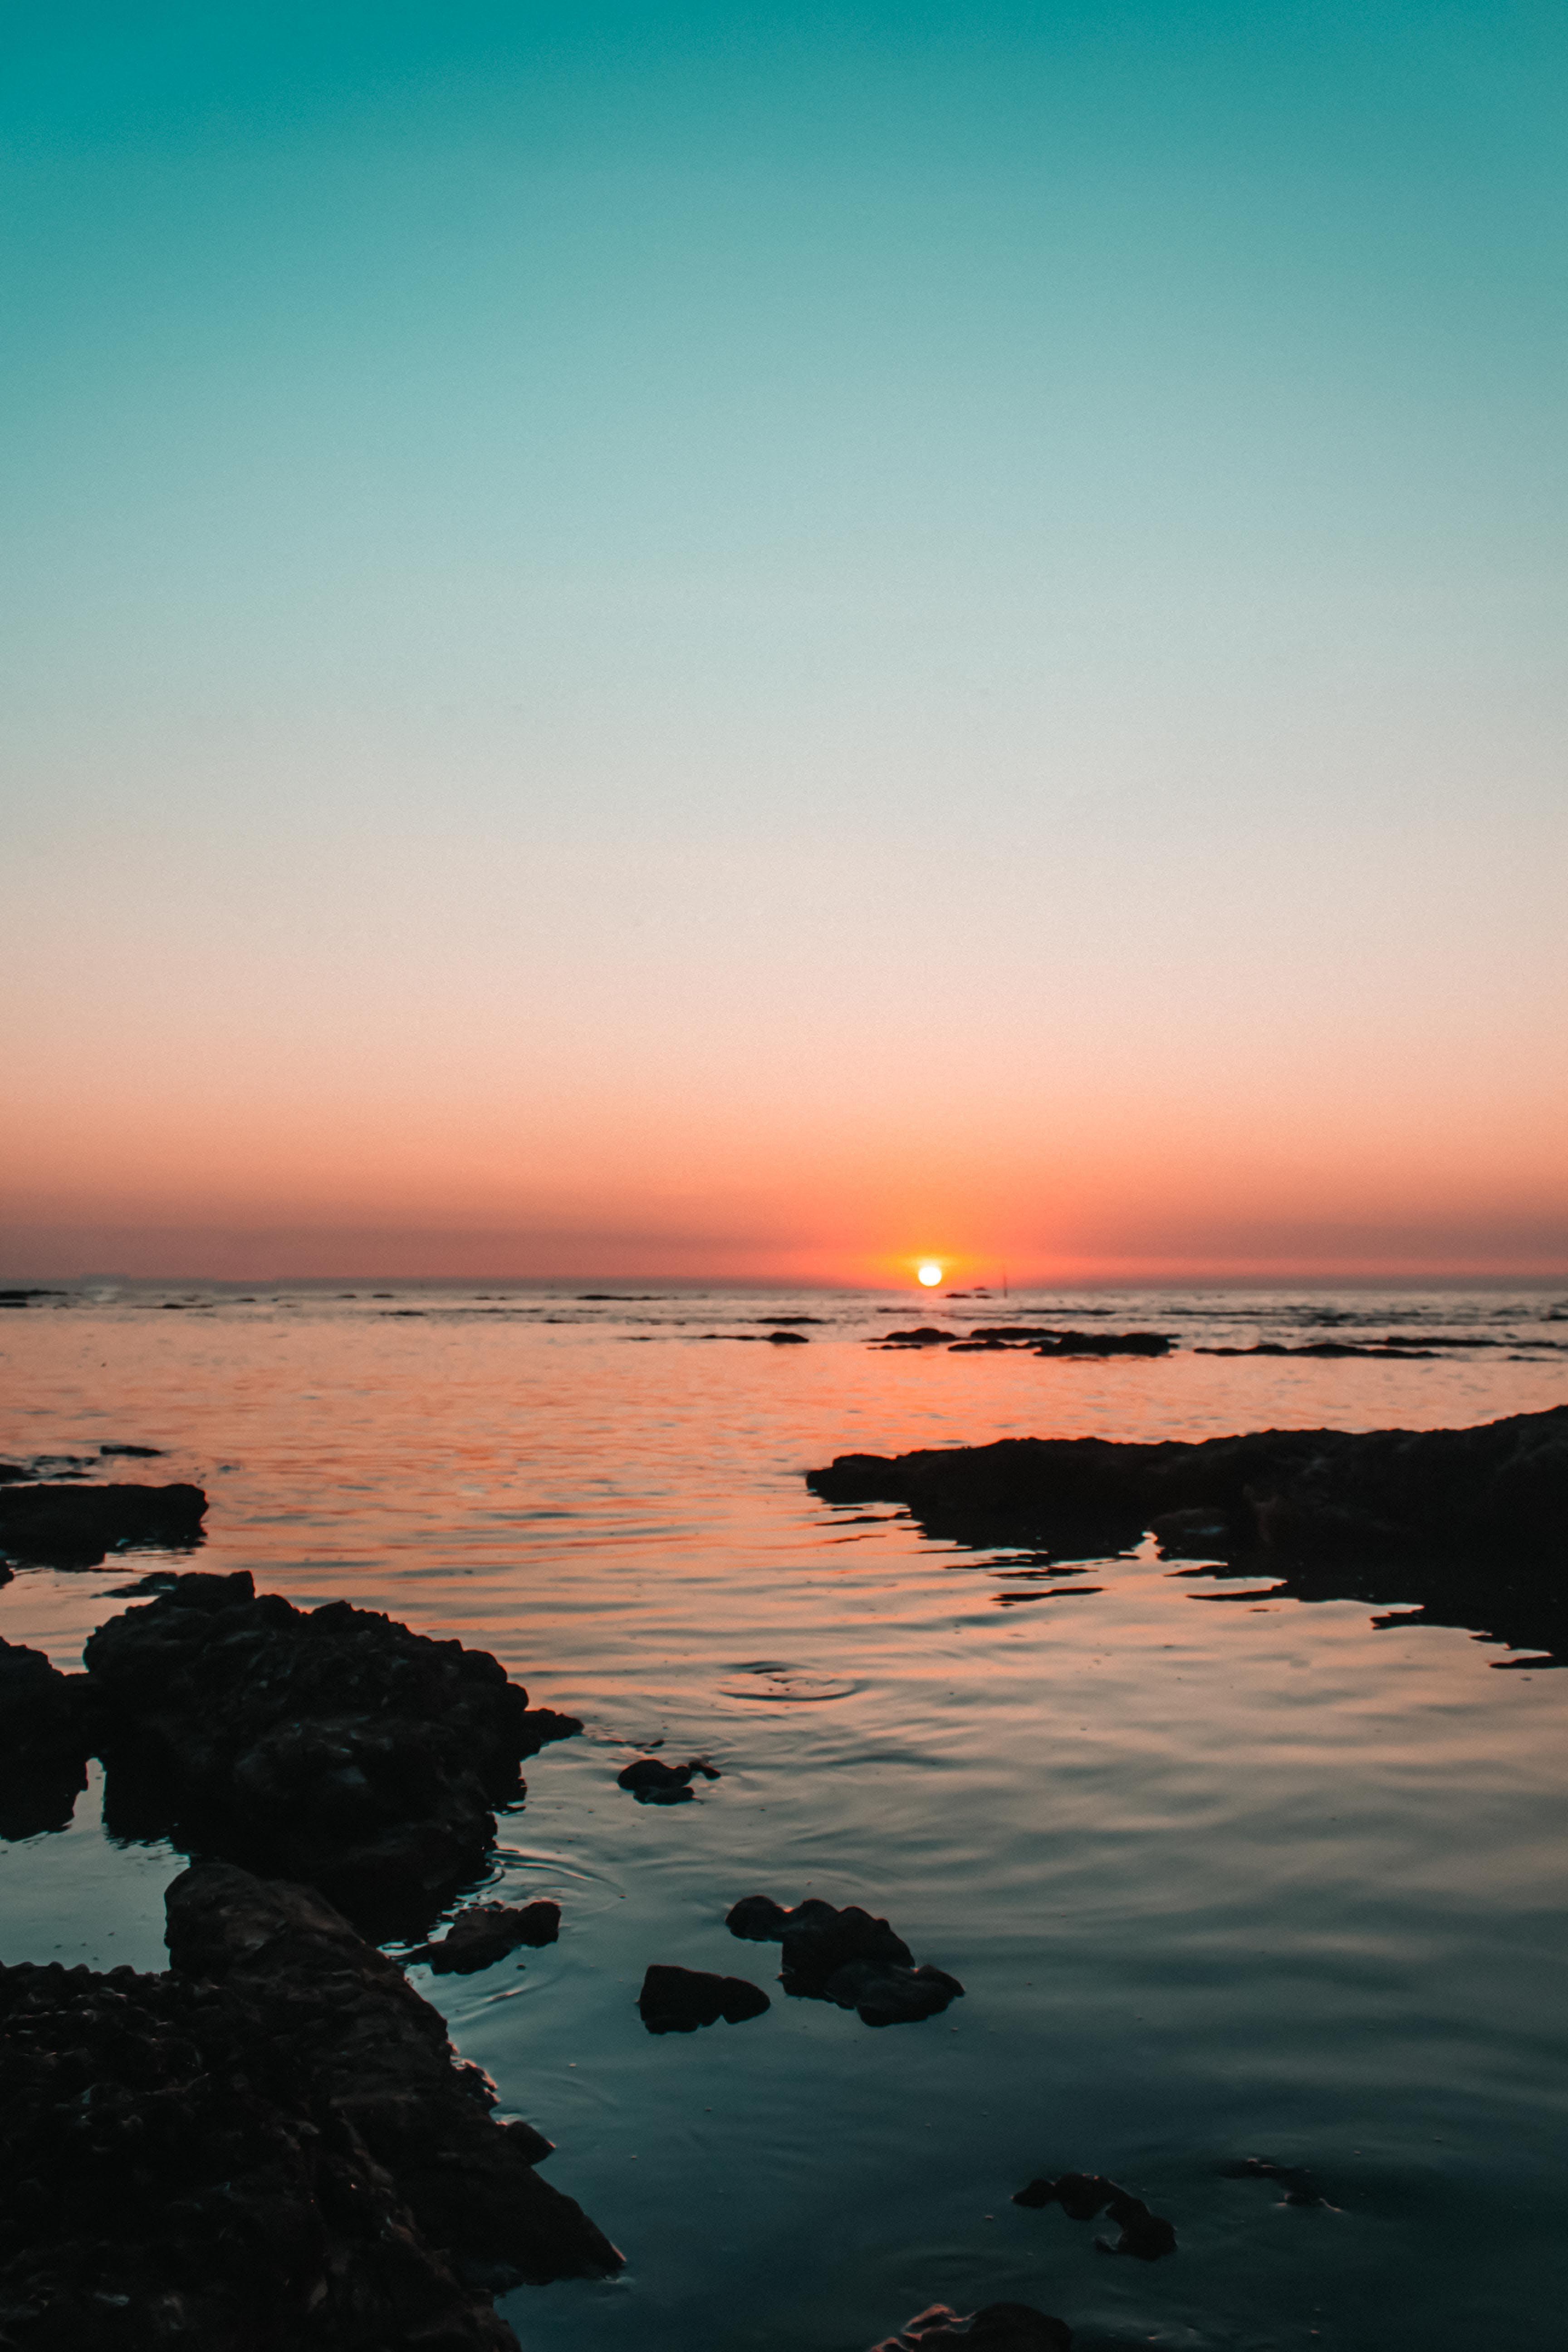 Free stock photo of beach sunset, blue water, sea, sunset